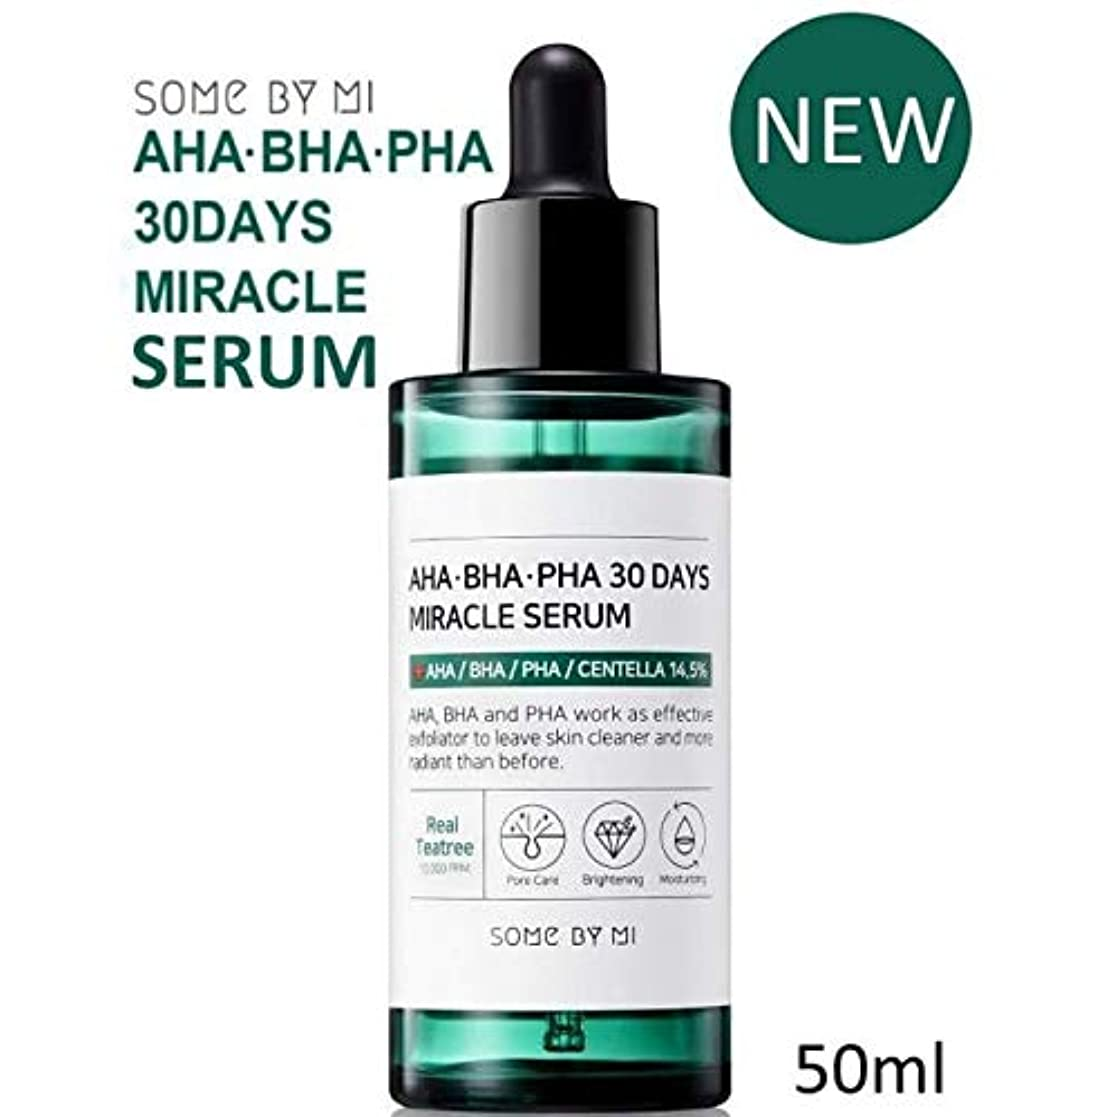 [Somebymi] AHA BHA PHA 30Days Miracle Serum 50ml/Korea Cosmetic [並行輸入品]